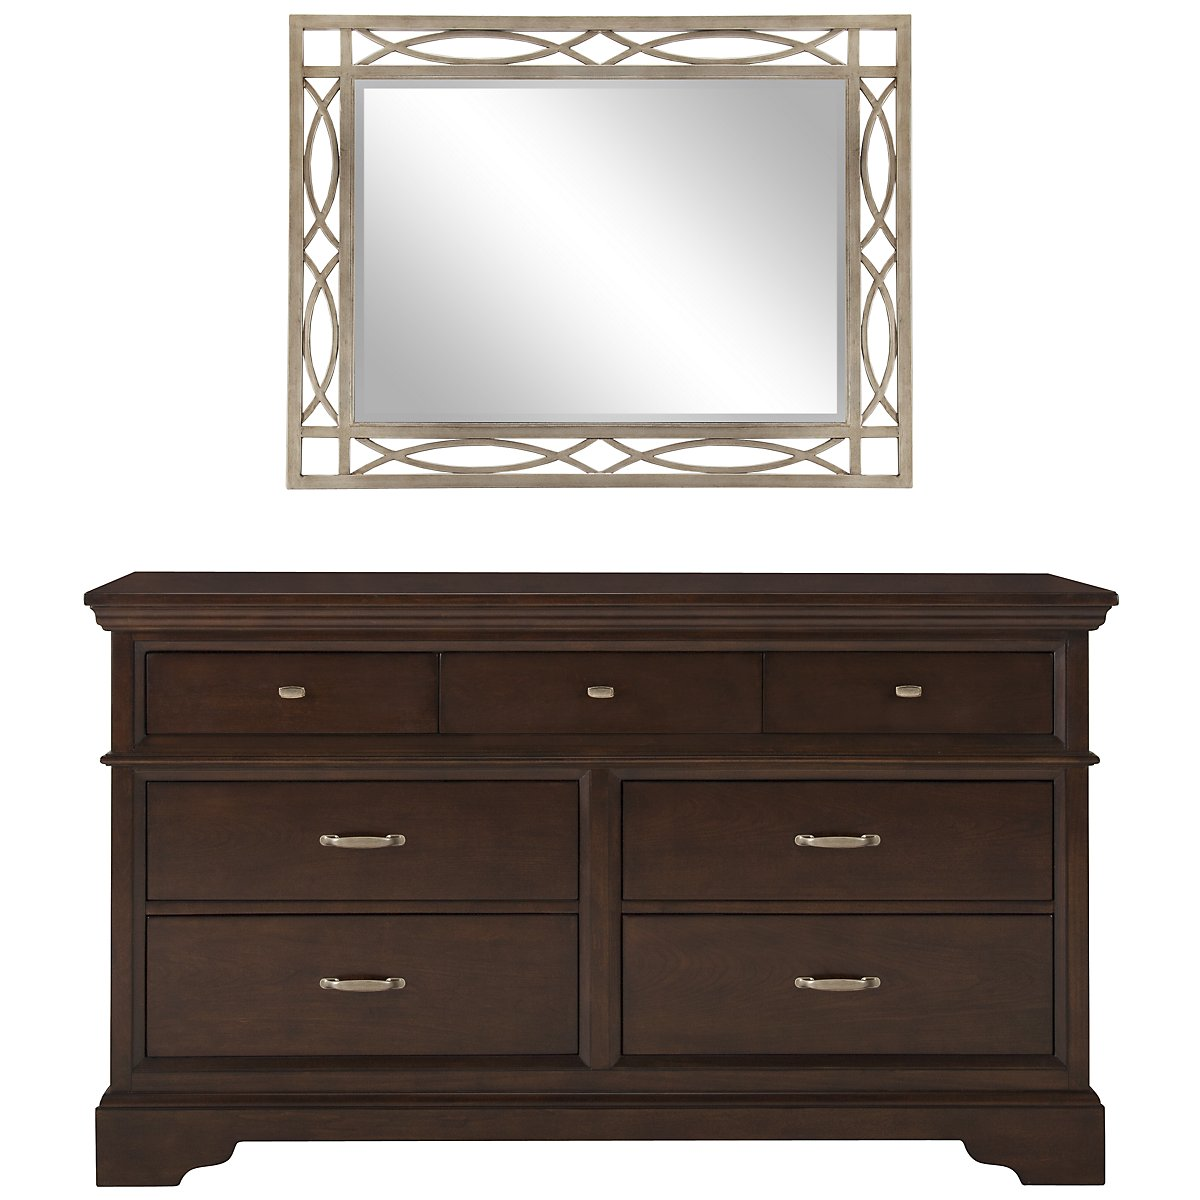 Canyon Dark Tone Small Dresser & Mirror